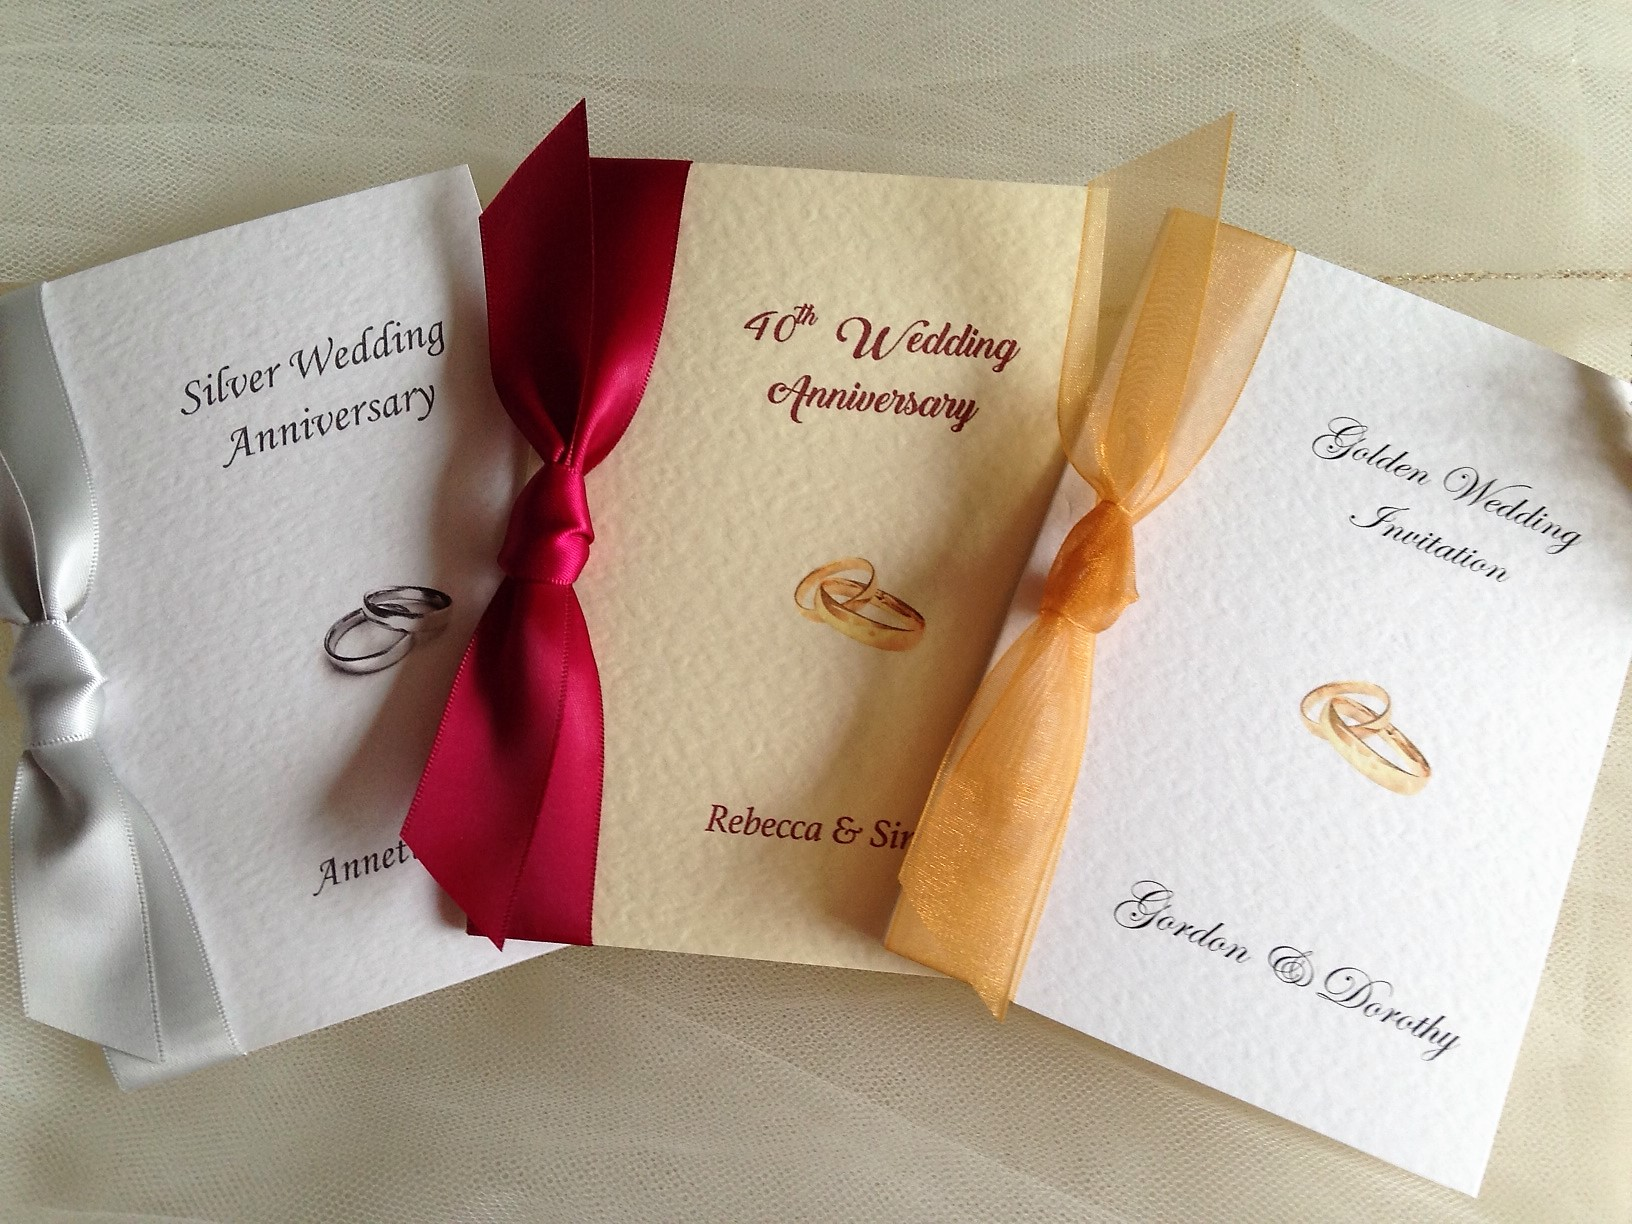 10th Wedding Anniversary Invitations: Rings Wedding Anniversary Invitations